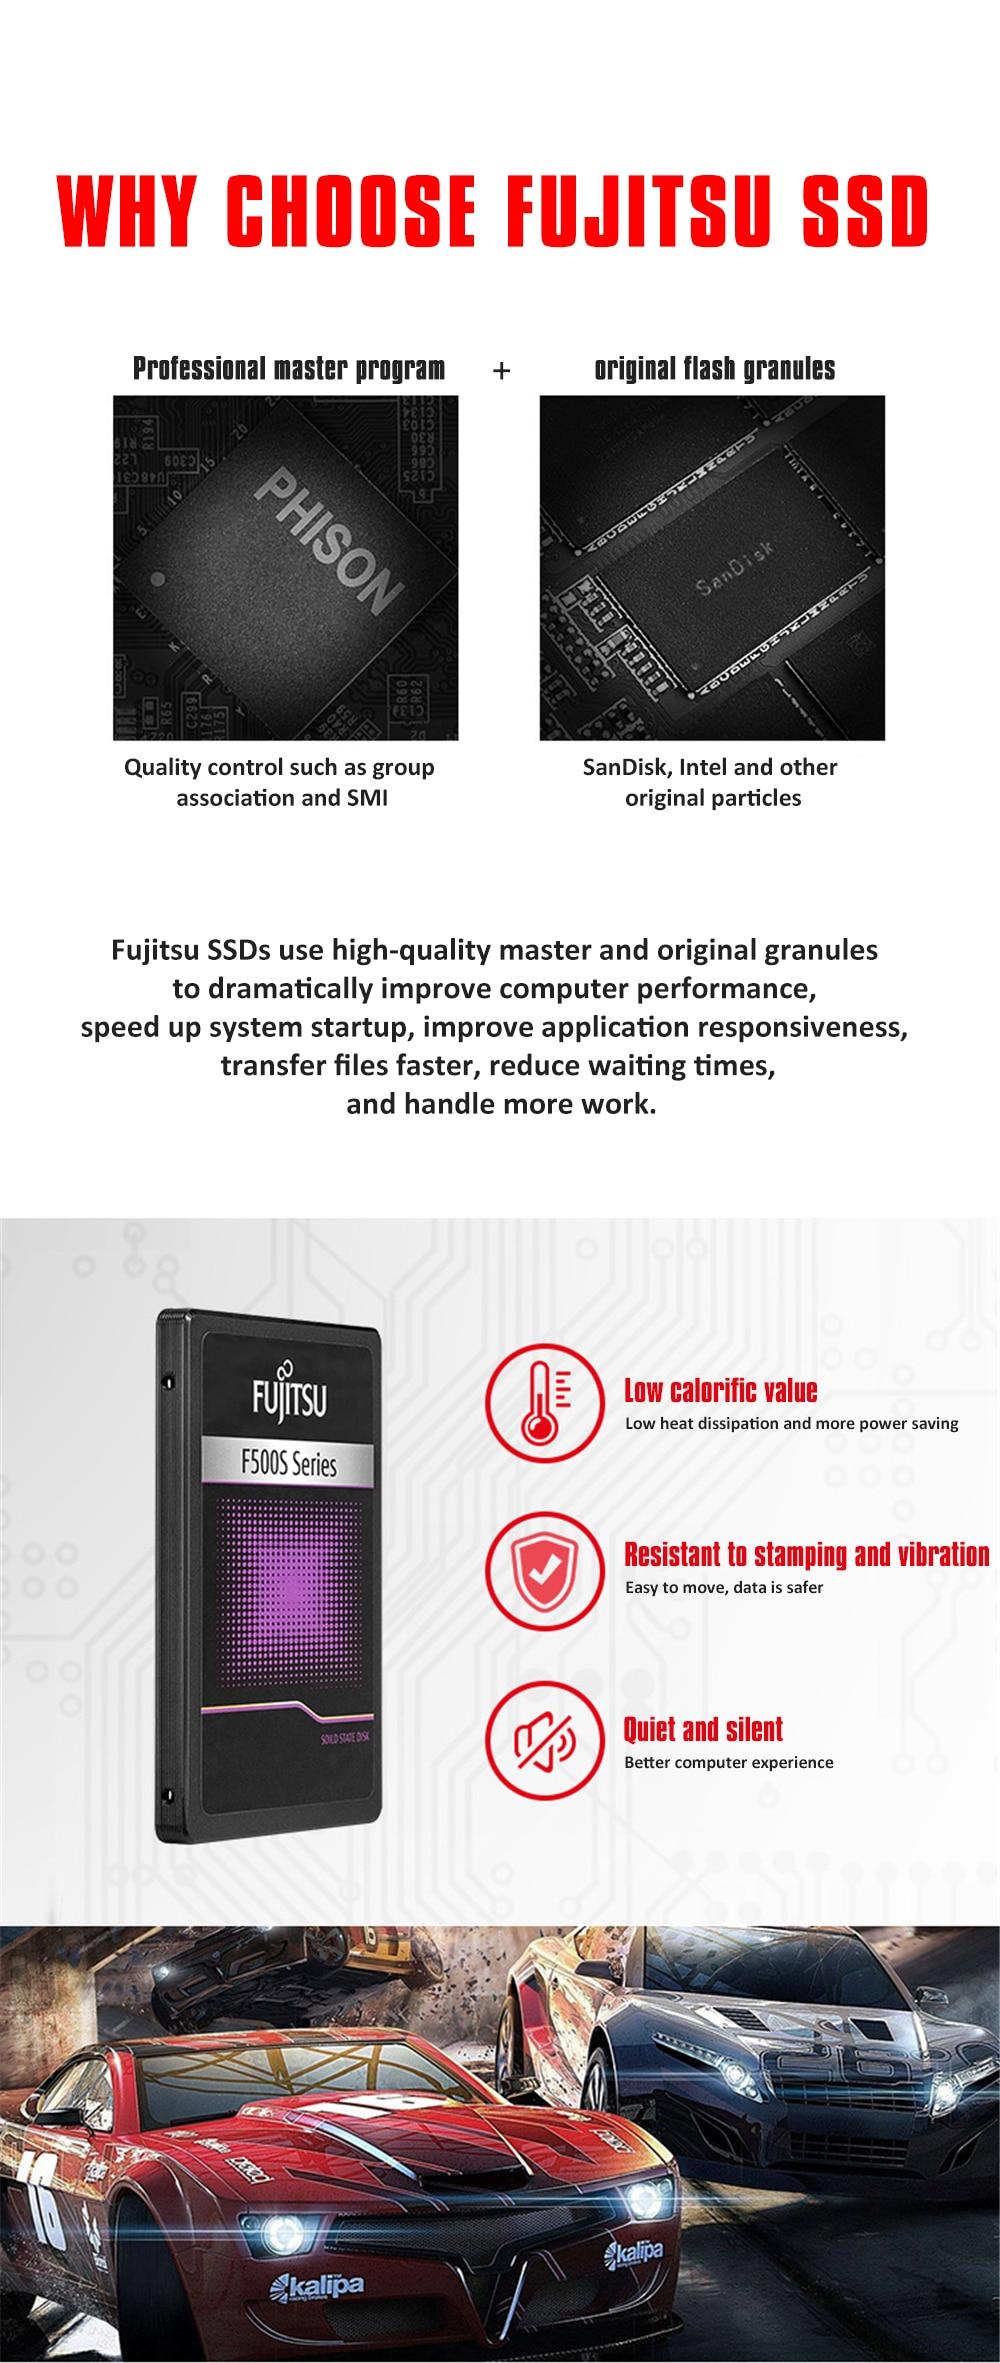 "FUJITSU 2.5"" ssd 1tb sata3 ssd 1024G 3D NAND Flash SMI/Phison/Realtek TLC ssd hard drive Solid State Drives for desktop laptop 18"